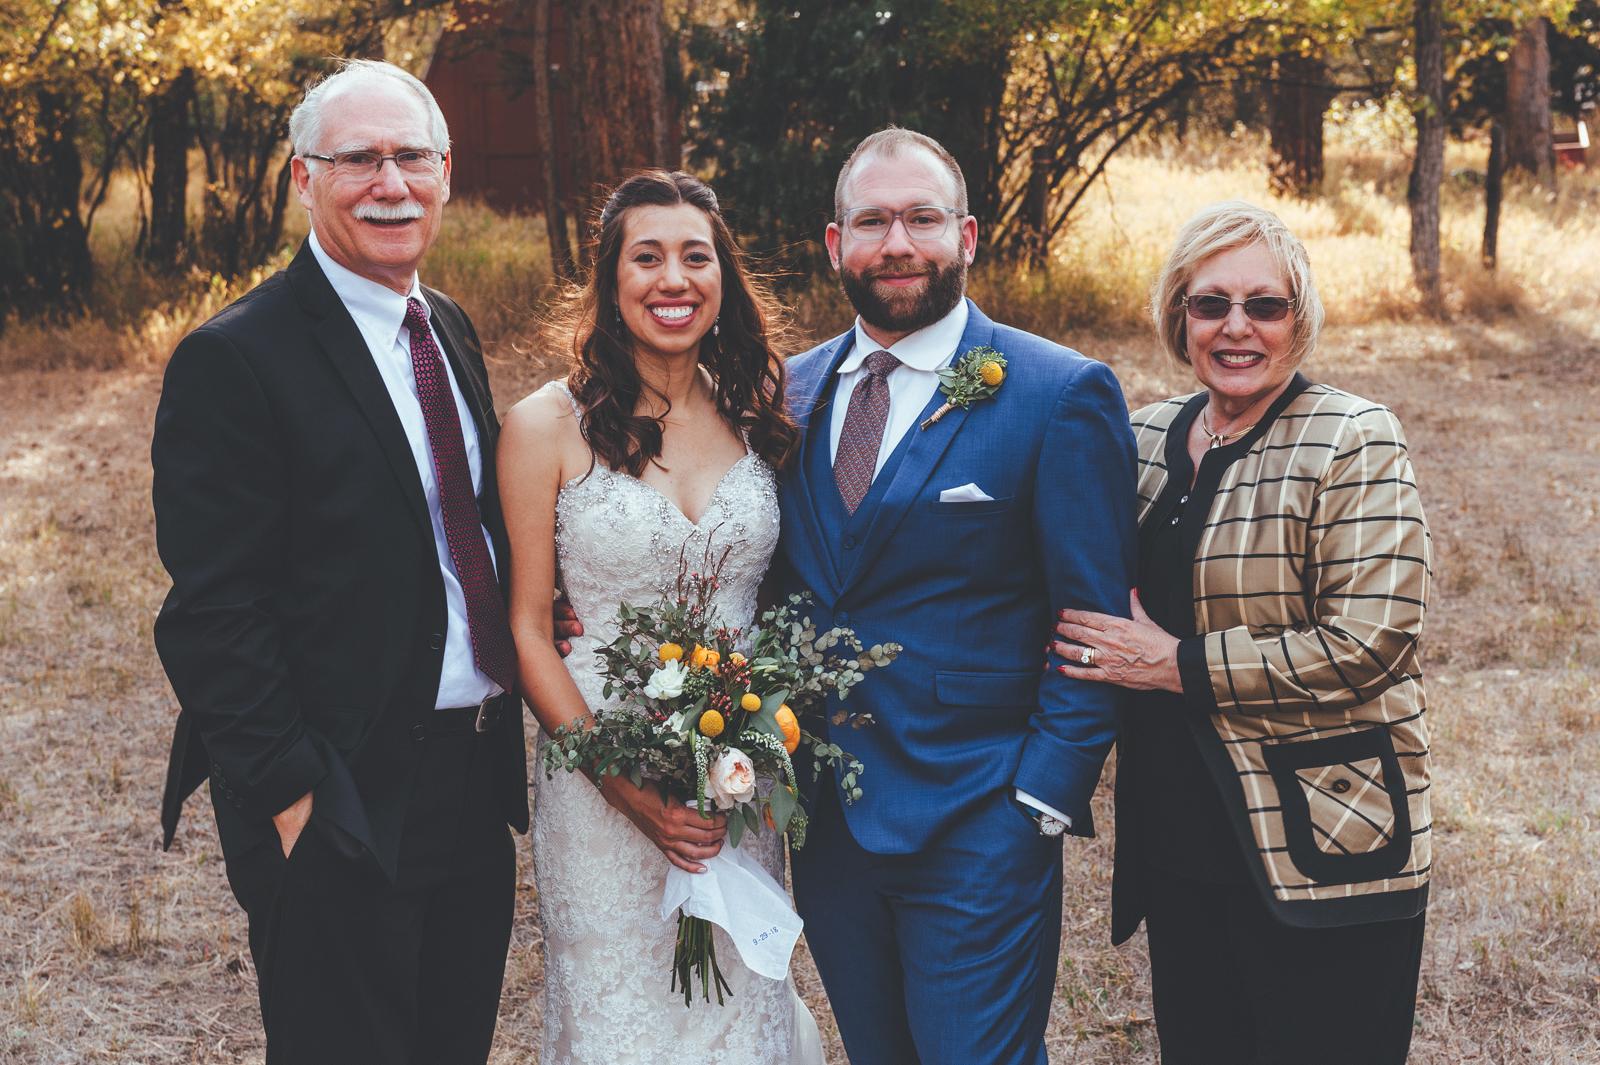 ChadFahnestockPhotography-estes-park-wedding-photography-032.jpg